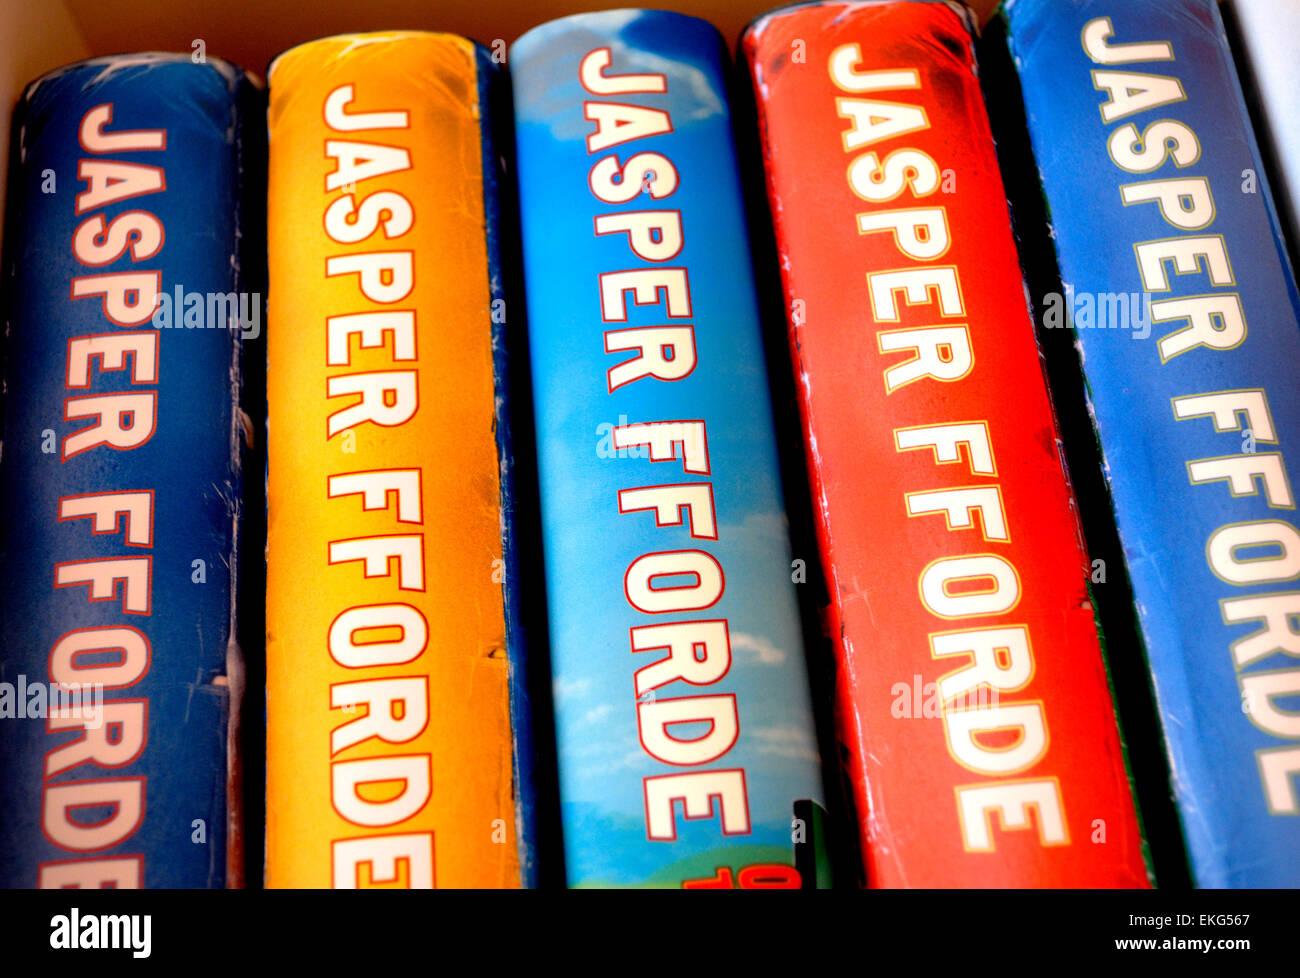 Hardback Jasper Fforde books on a bookshelf - Stock Image